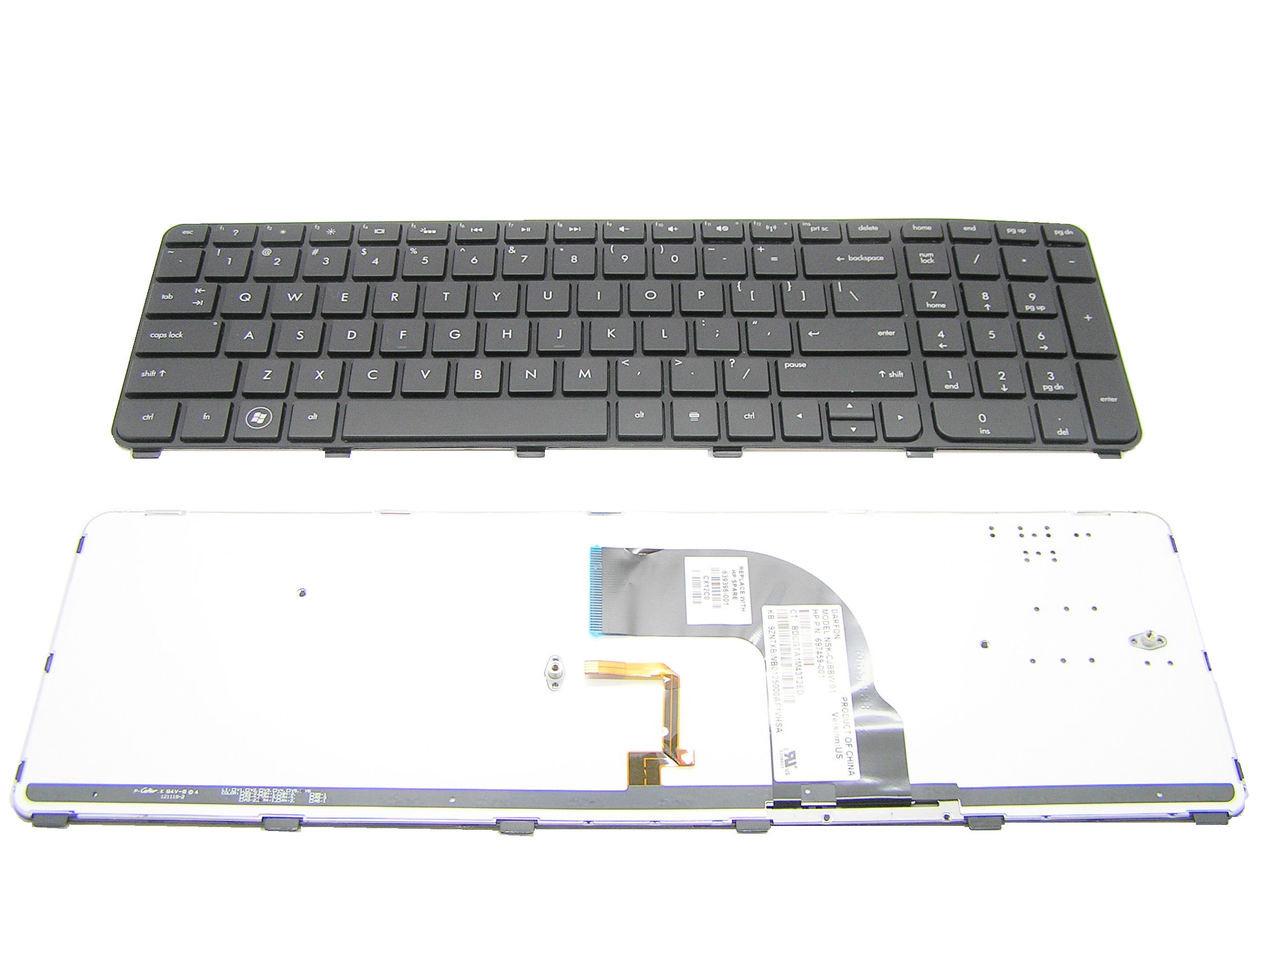 New HP Pavilion DV7-7000 DV7T-7000 DV7-7100 M7-1000 Keyboard US With Backlit